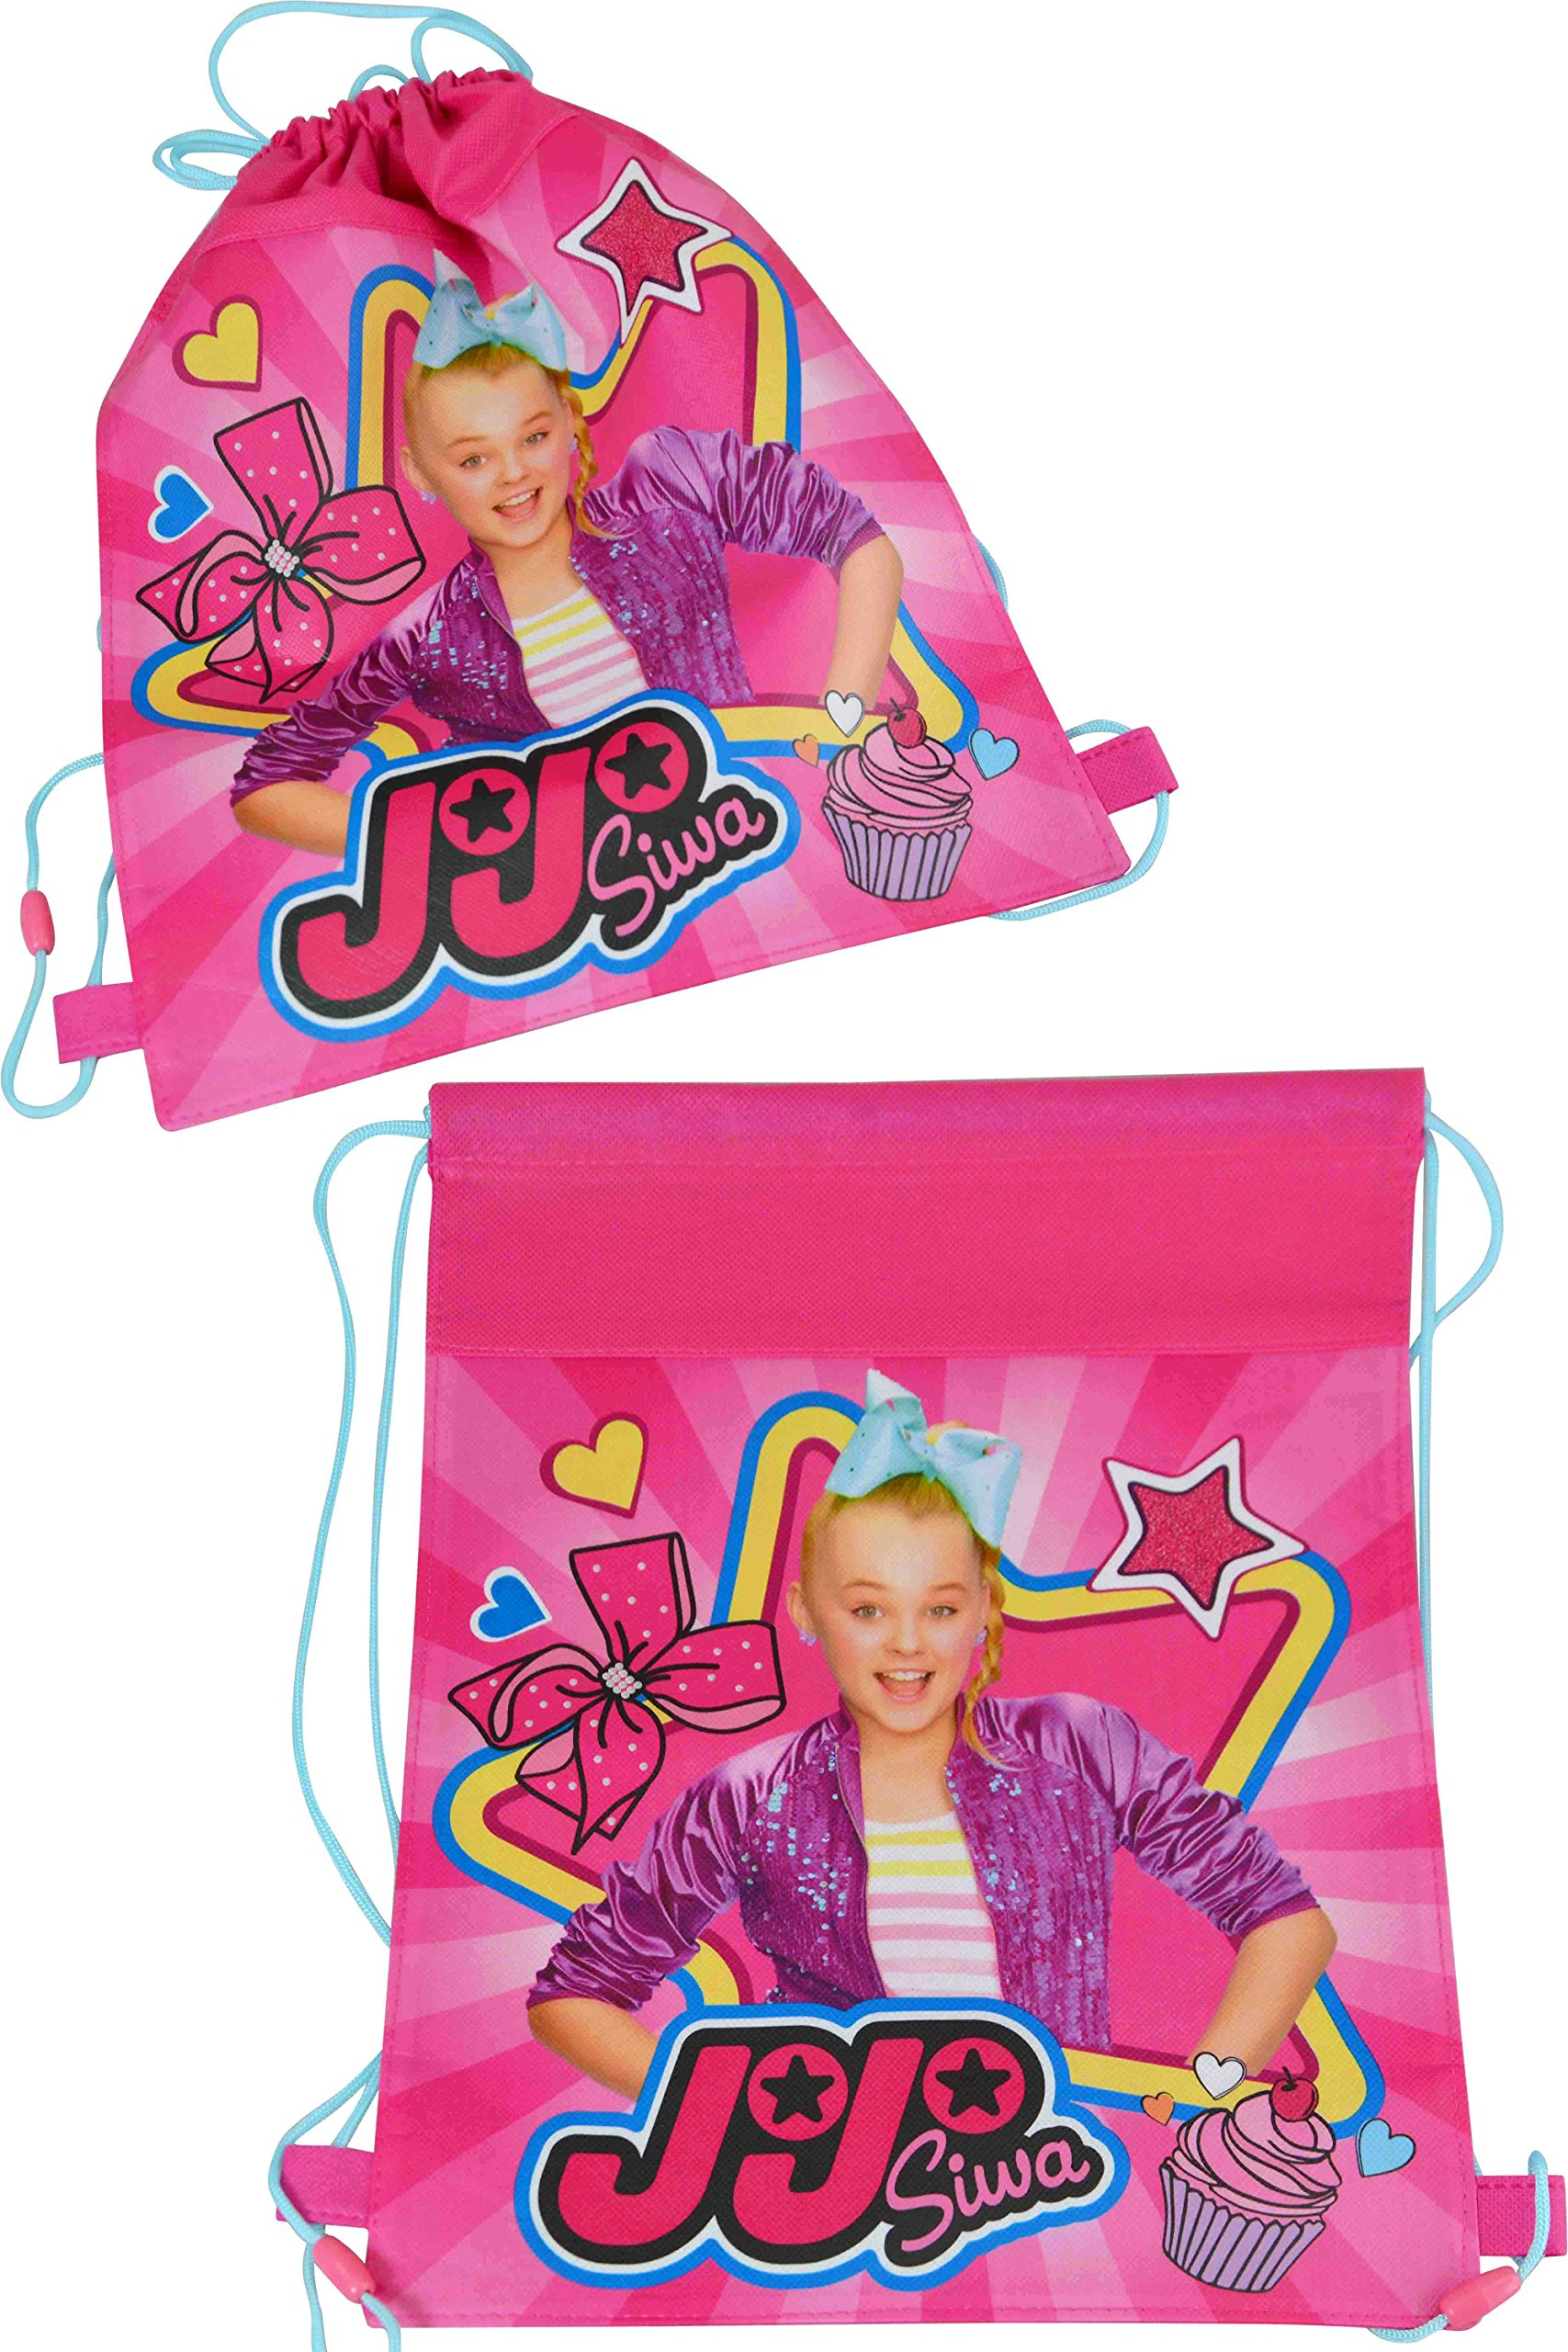 JoJo Siwa Travel Fun Set, Digital Watch and 2pk Kids Toothbrush with Travel Sling Bag by JoJo Siwa (Image #2)